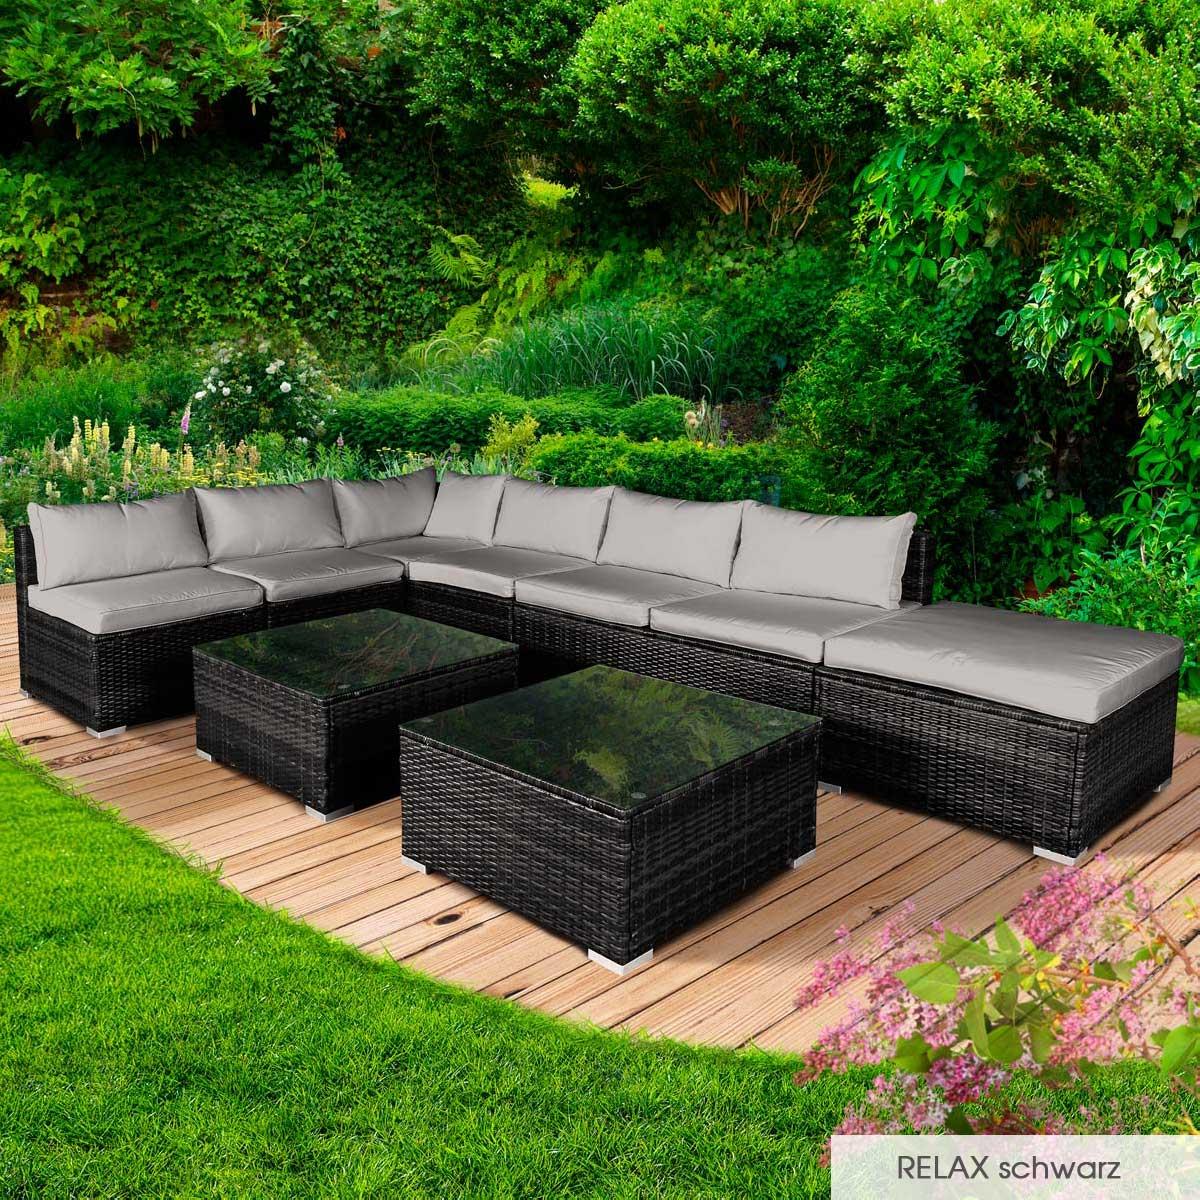 Gartenmoebel-Poly-Rattan-Lounge-Moebel-Sitzgarnitur-Gartengarnitur-Sitzgruppe-Sofa Indexbild 28